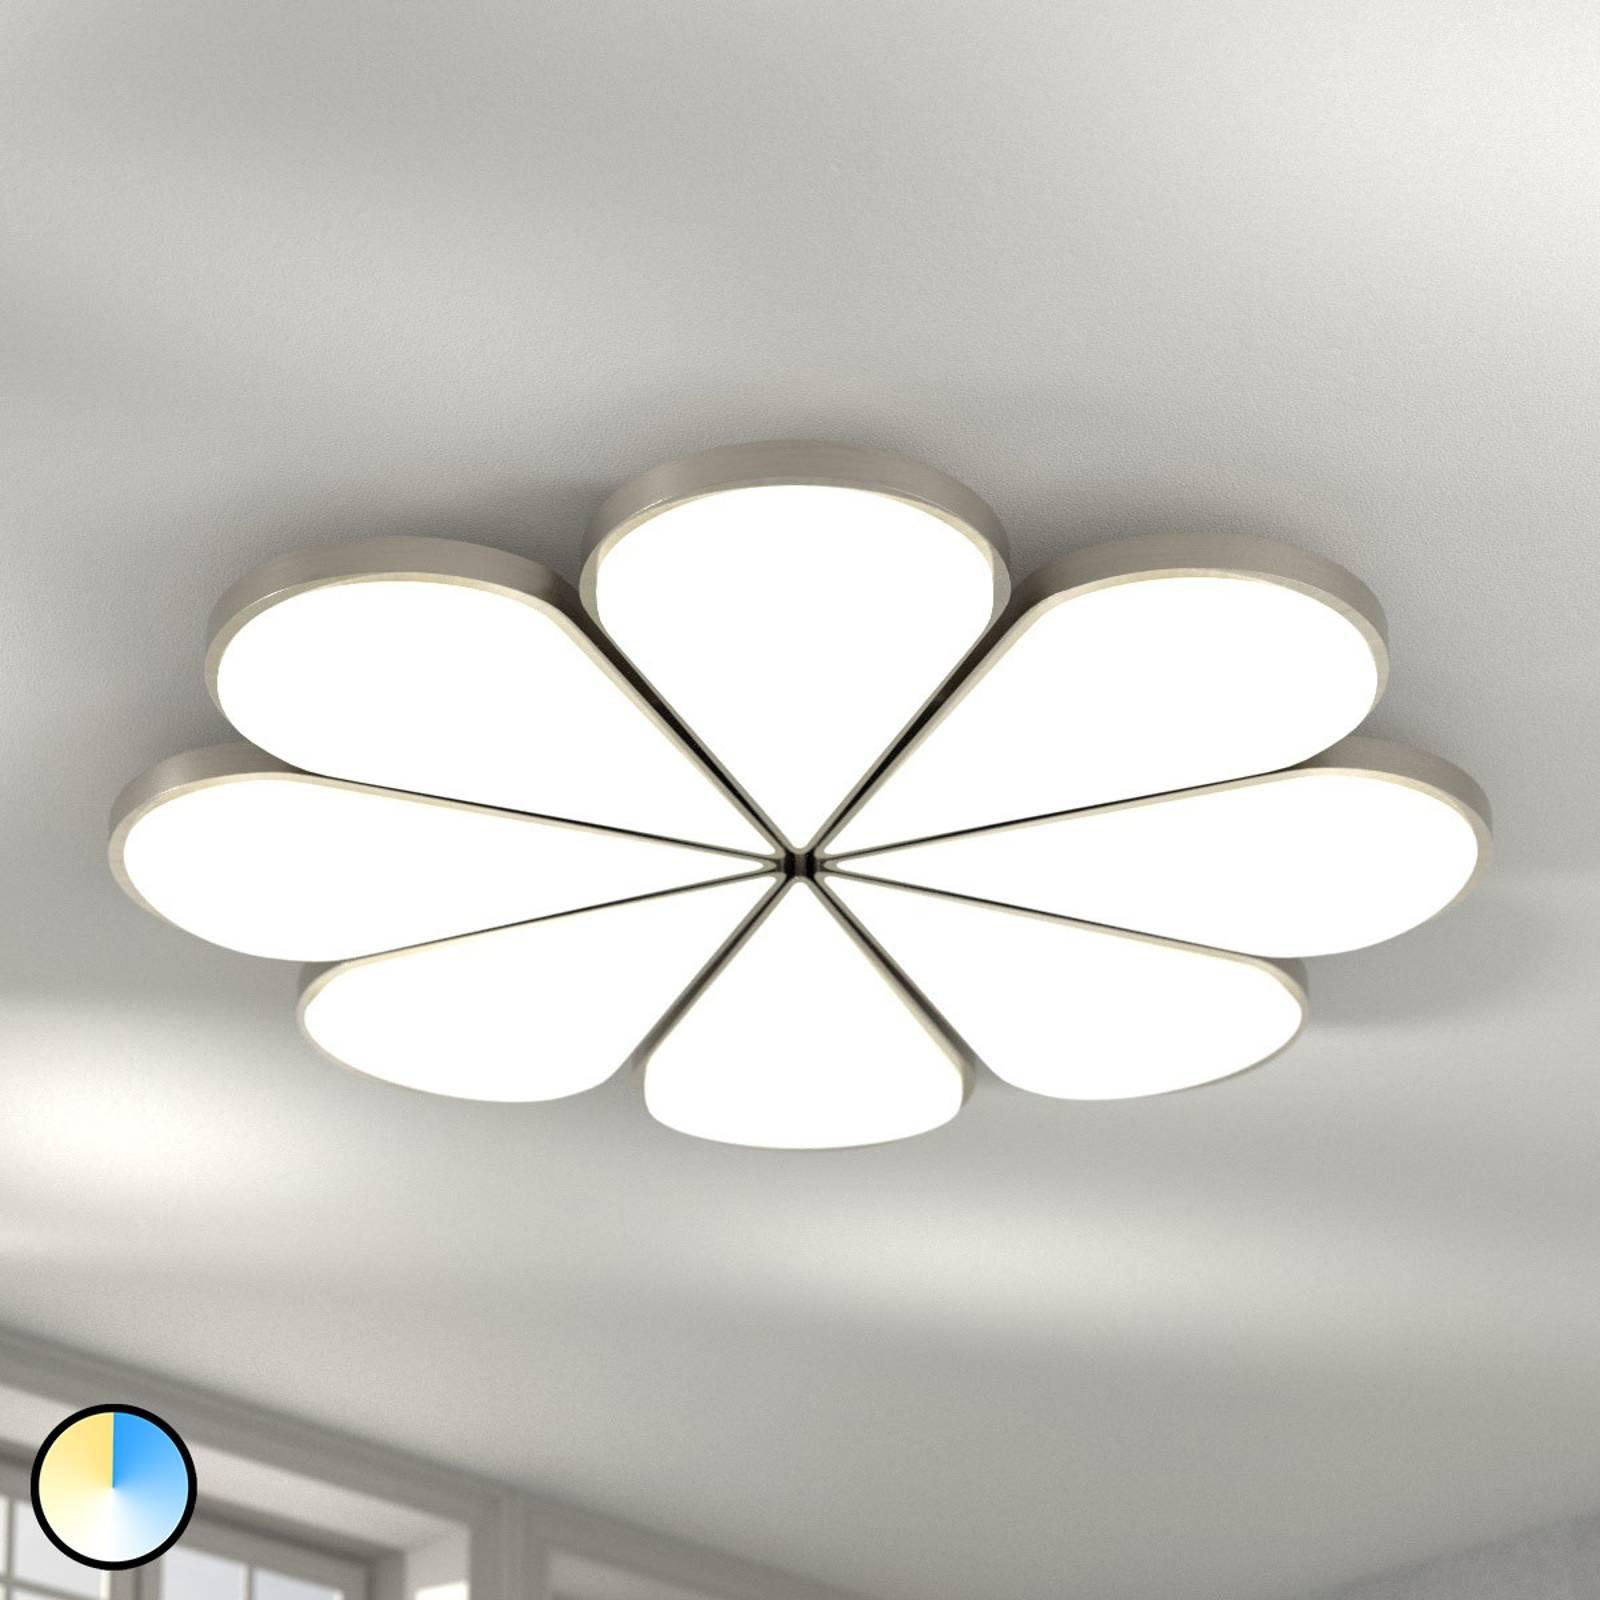 B-Leuchten Flower LED plafondlamp CCT Ø 81 cm